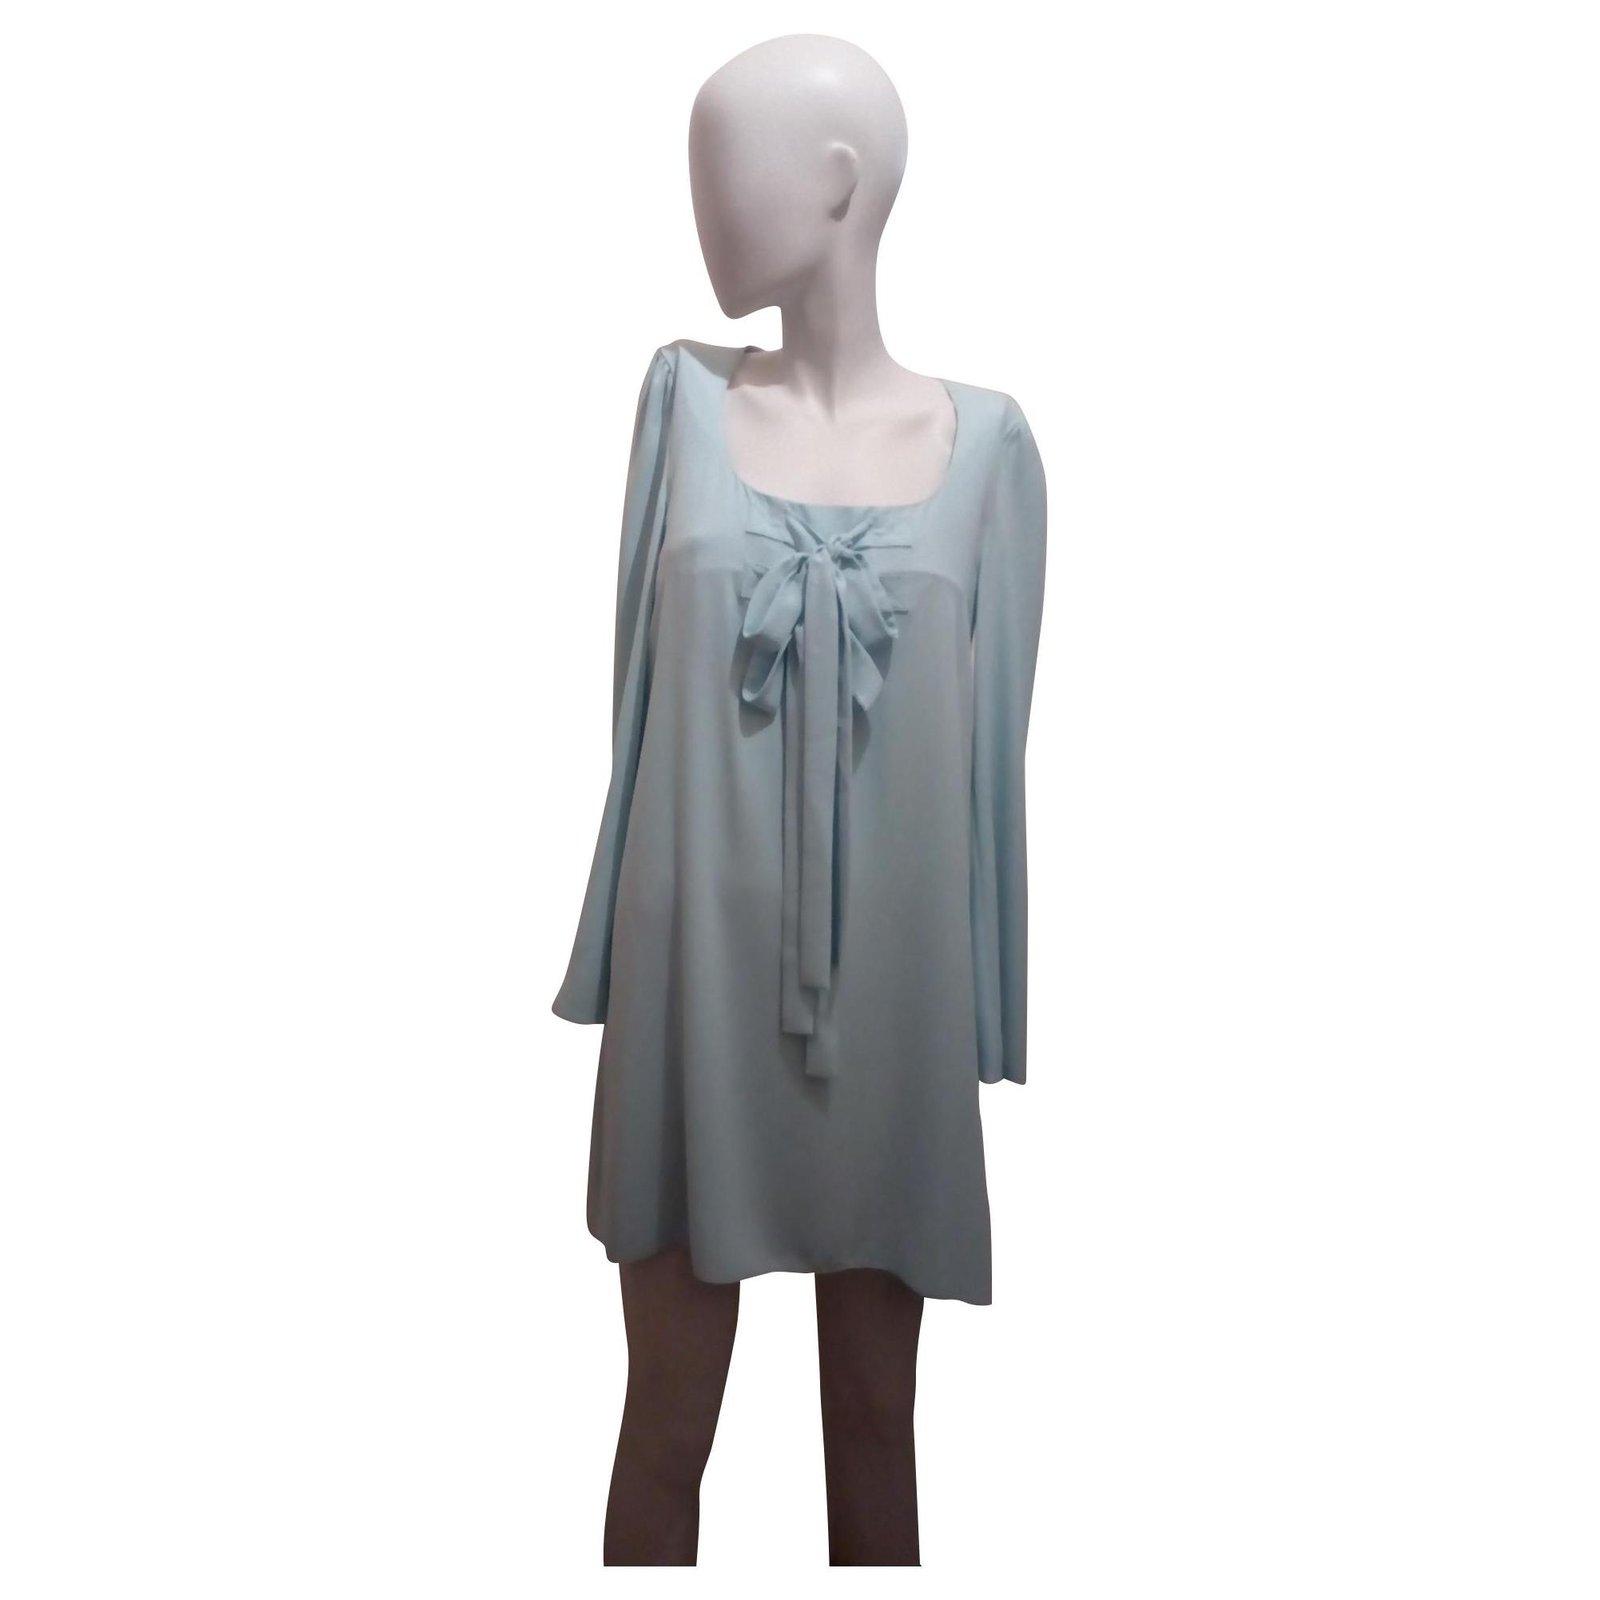 Robes Moschino Robe Bleu Ciel Polyester Triacetate Bleu Clair Ref 151213 Joli Closet